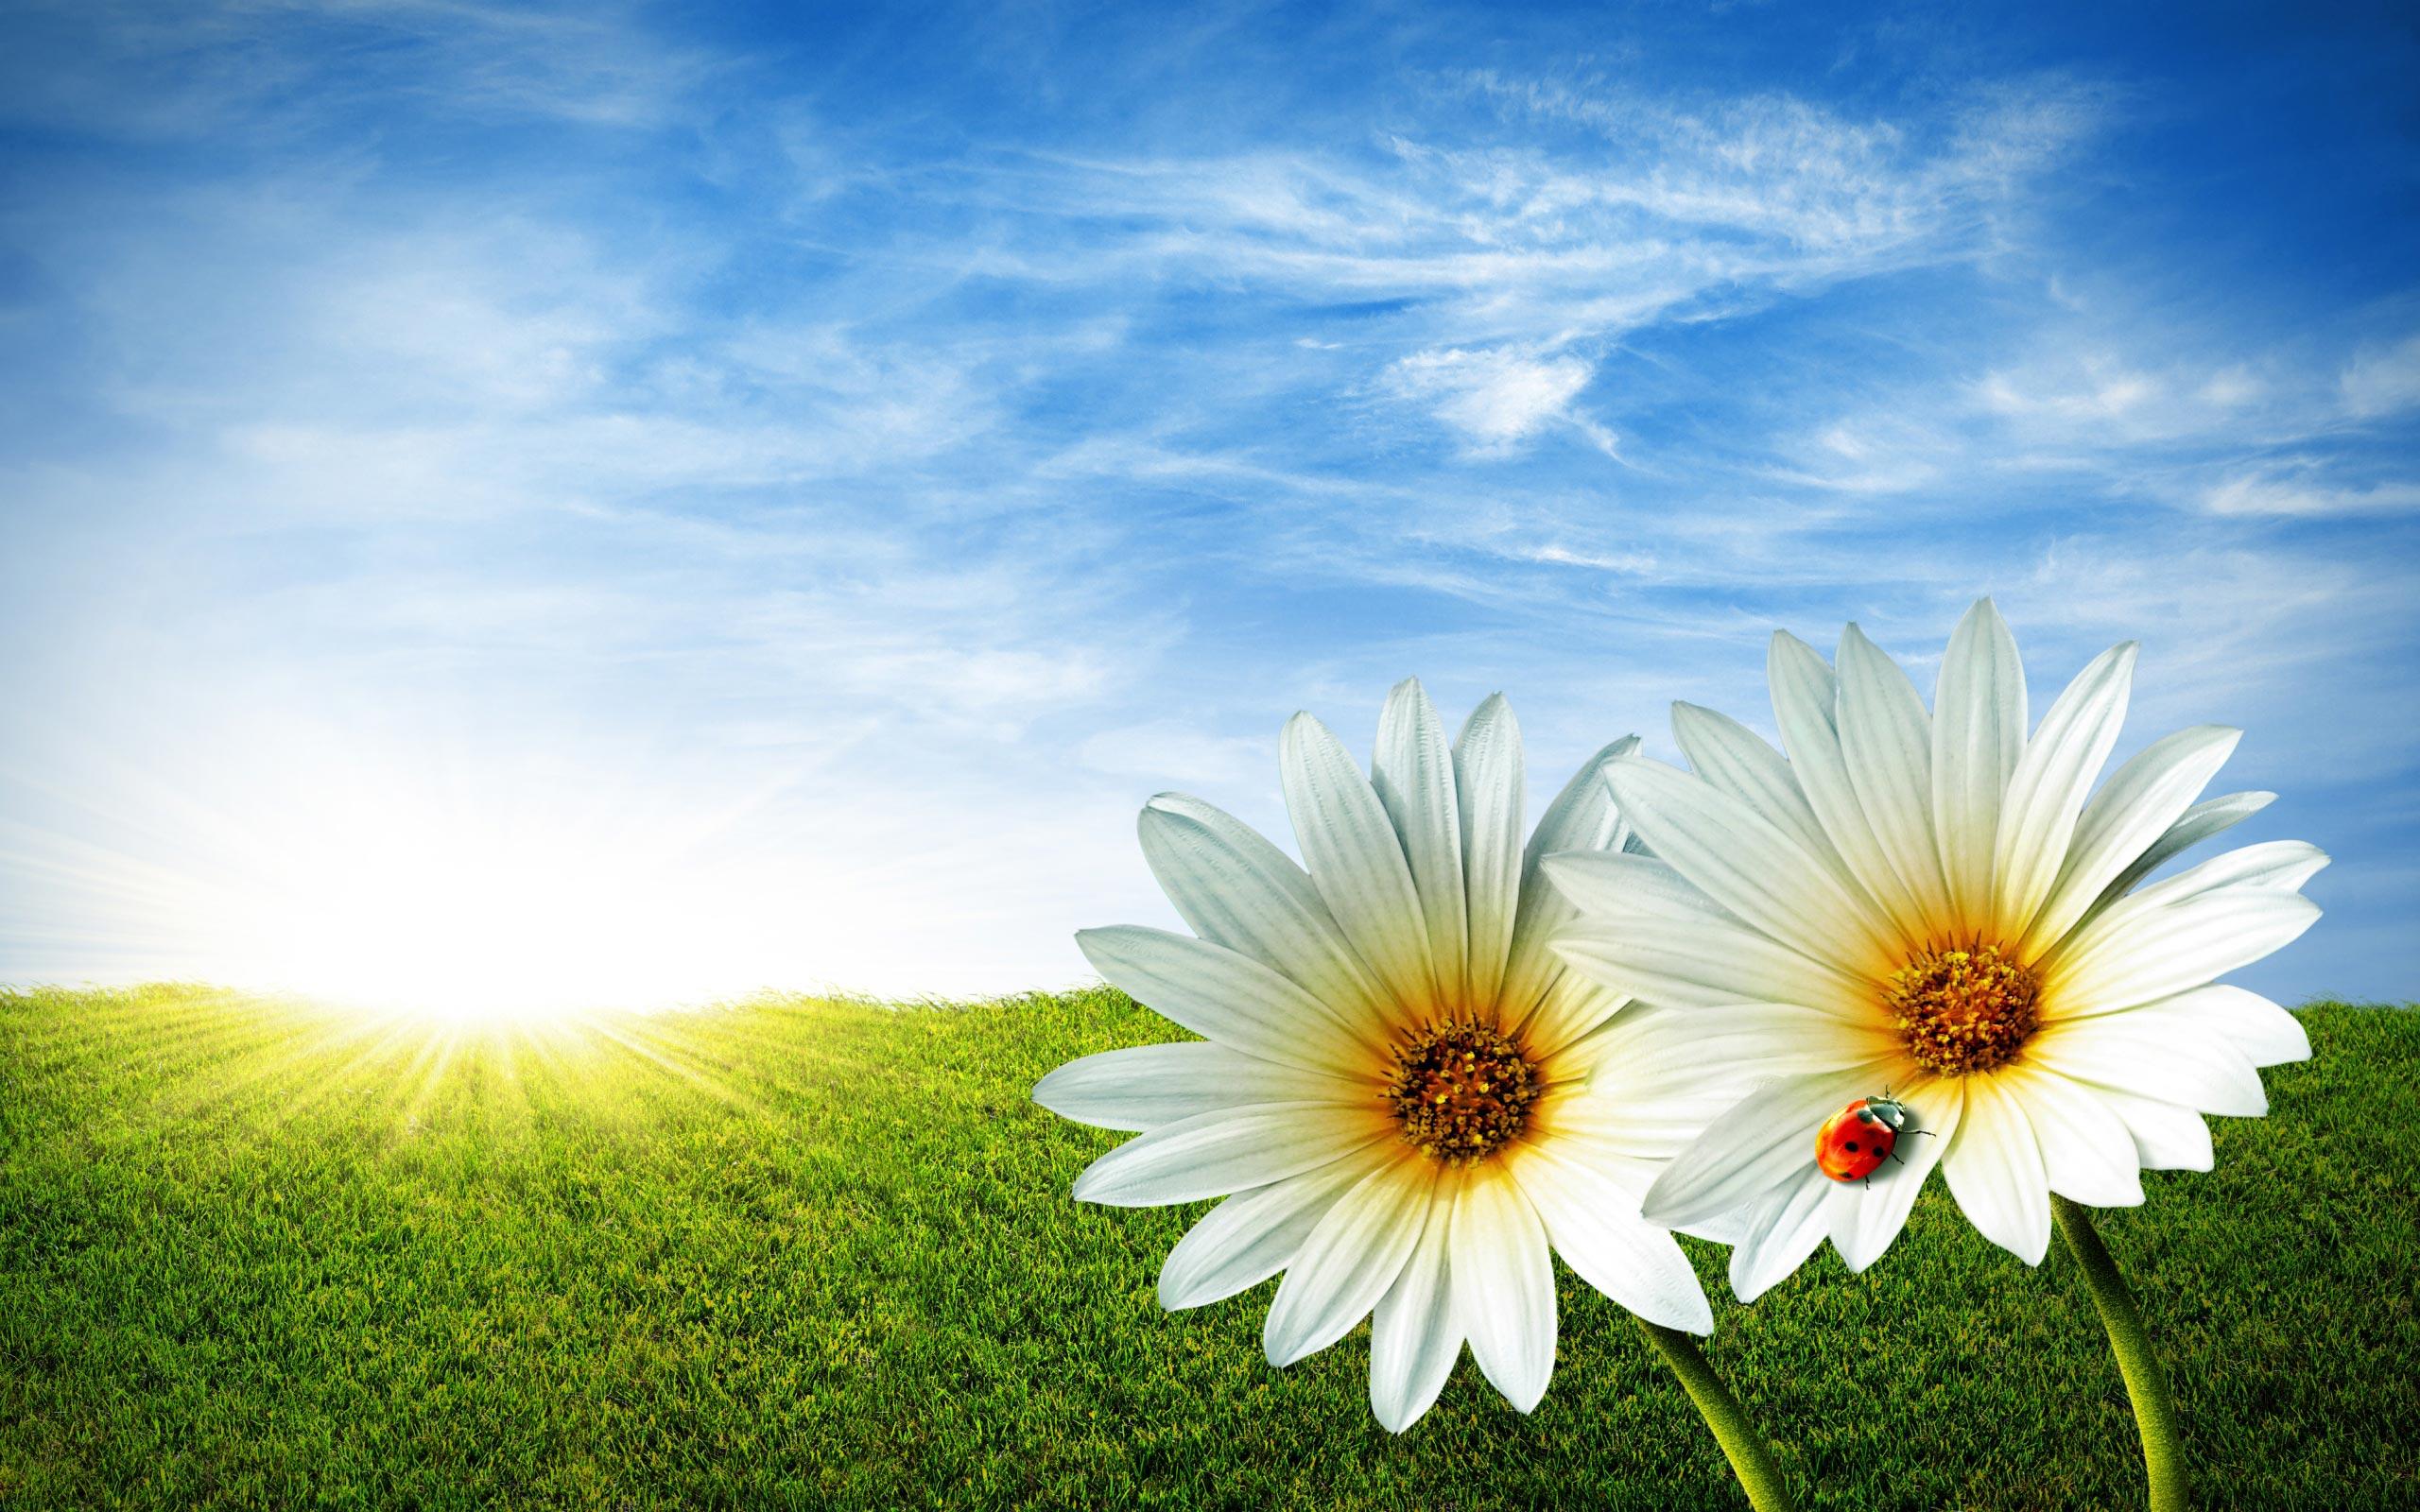 Spring Backgrounds Wallpaper ImageBankbiz 2560x1600